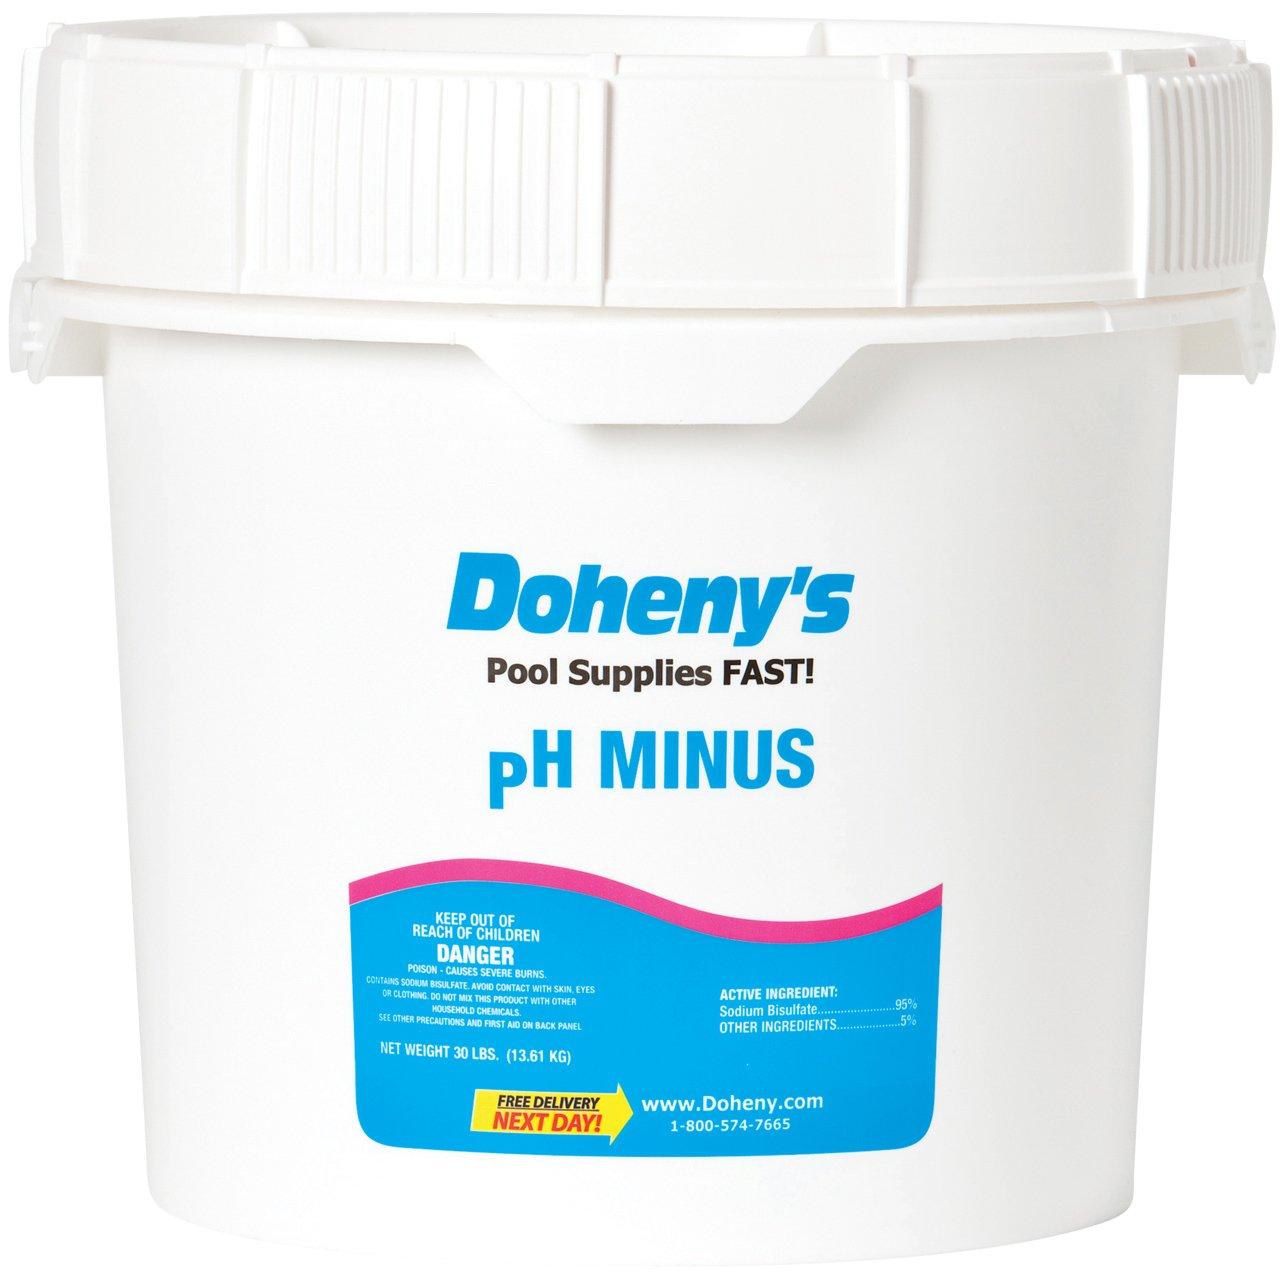 Doheny's pH Minus - 30 lbs. by Doheny's